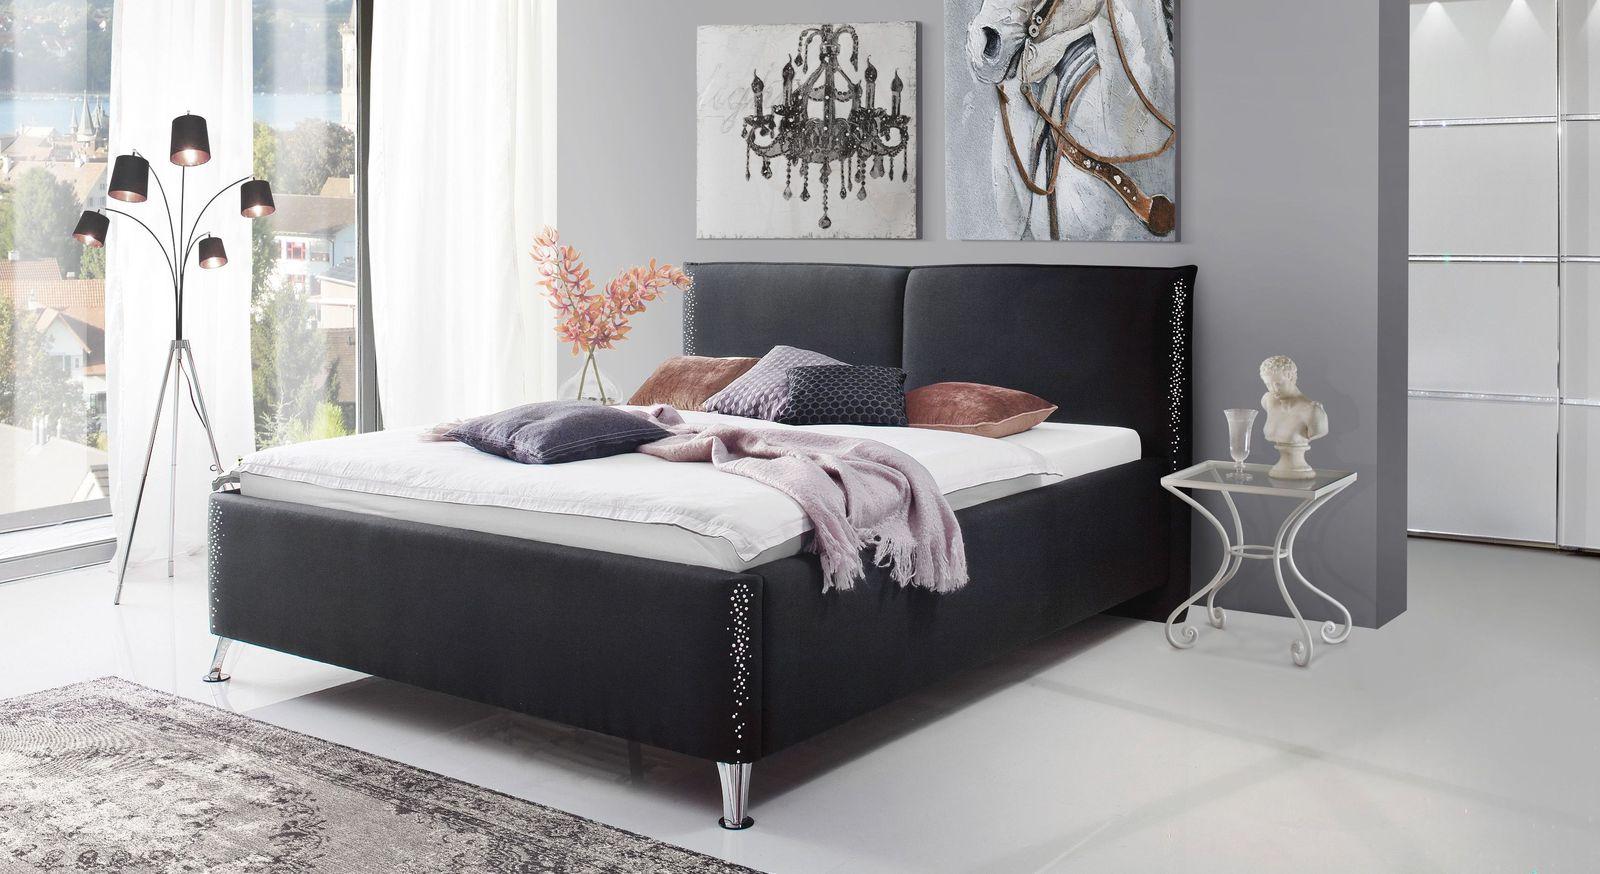 Passende Produkte zum Bett Capistello